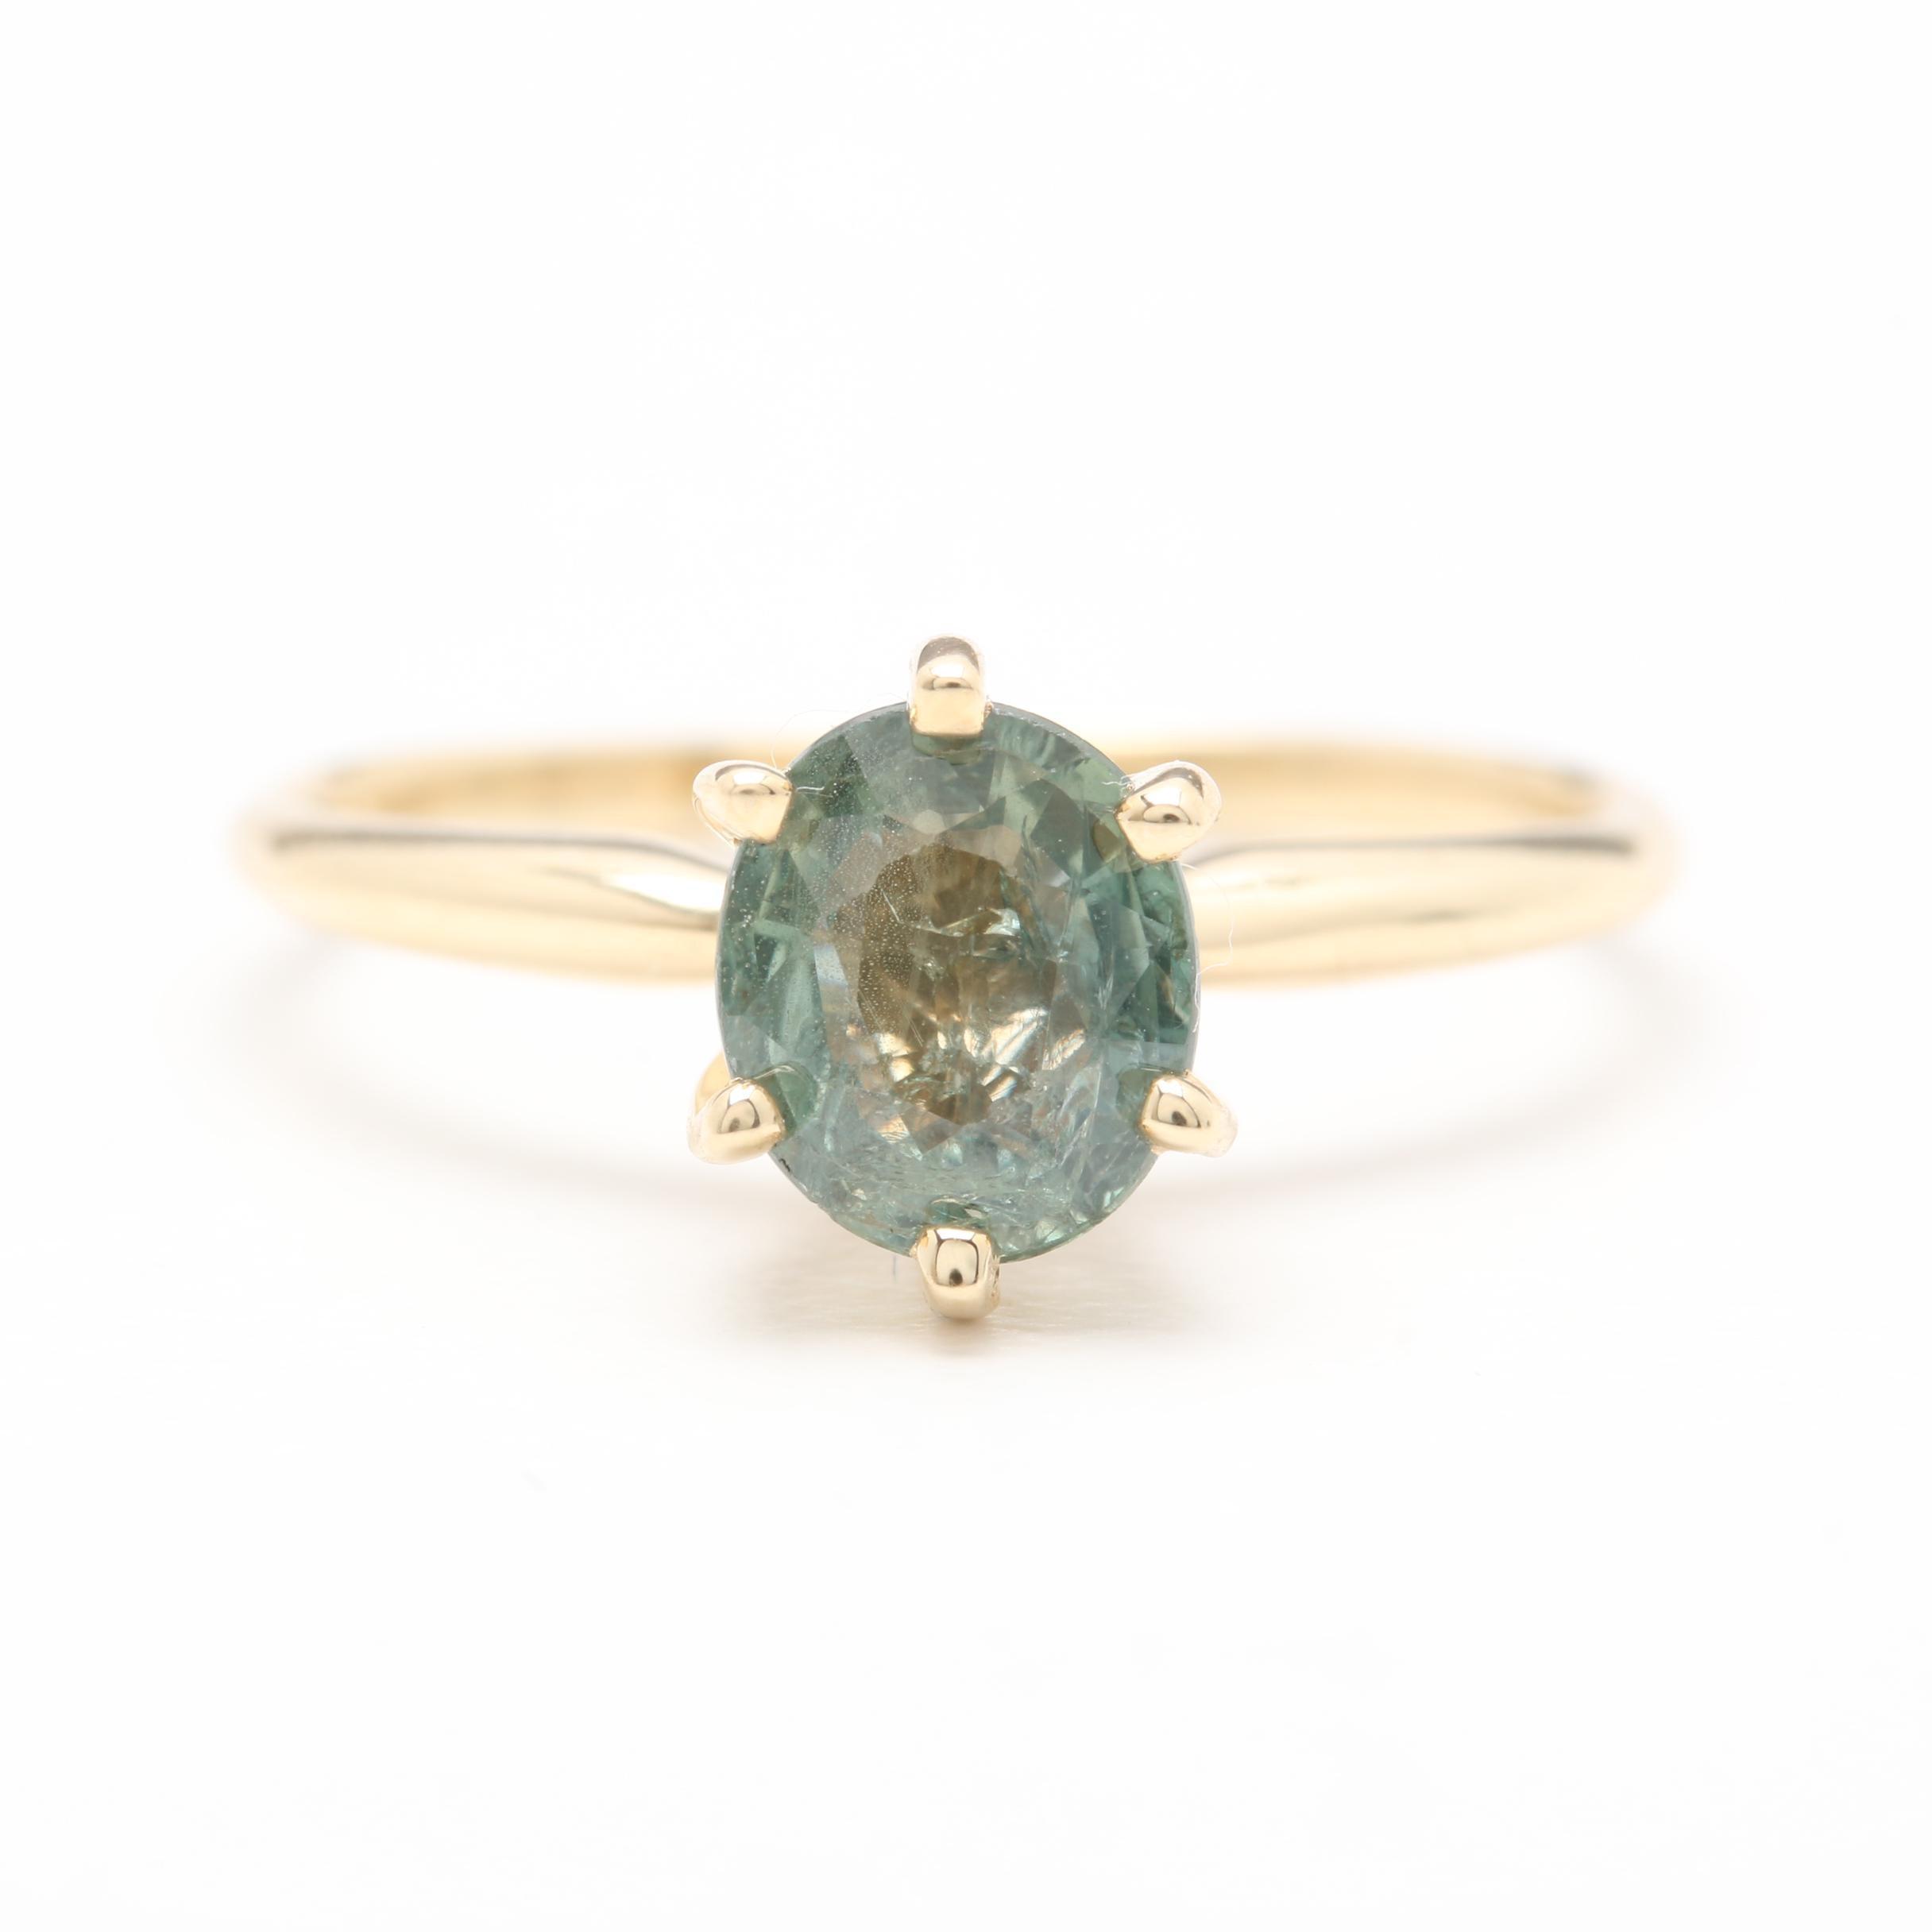 14K Yellow Gold 1.04 CT Sapphire Ring